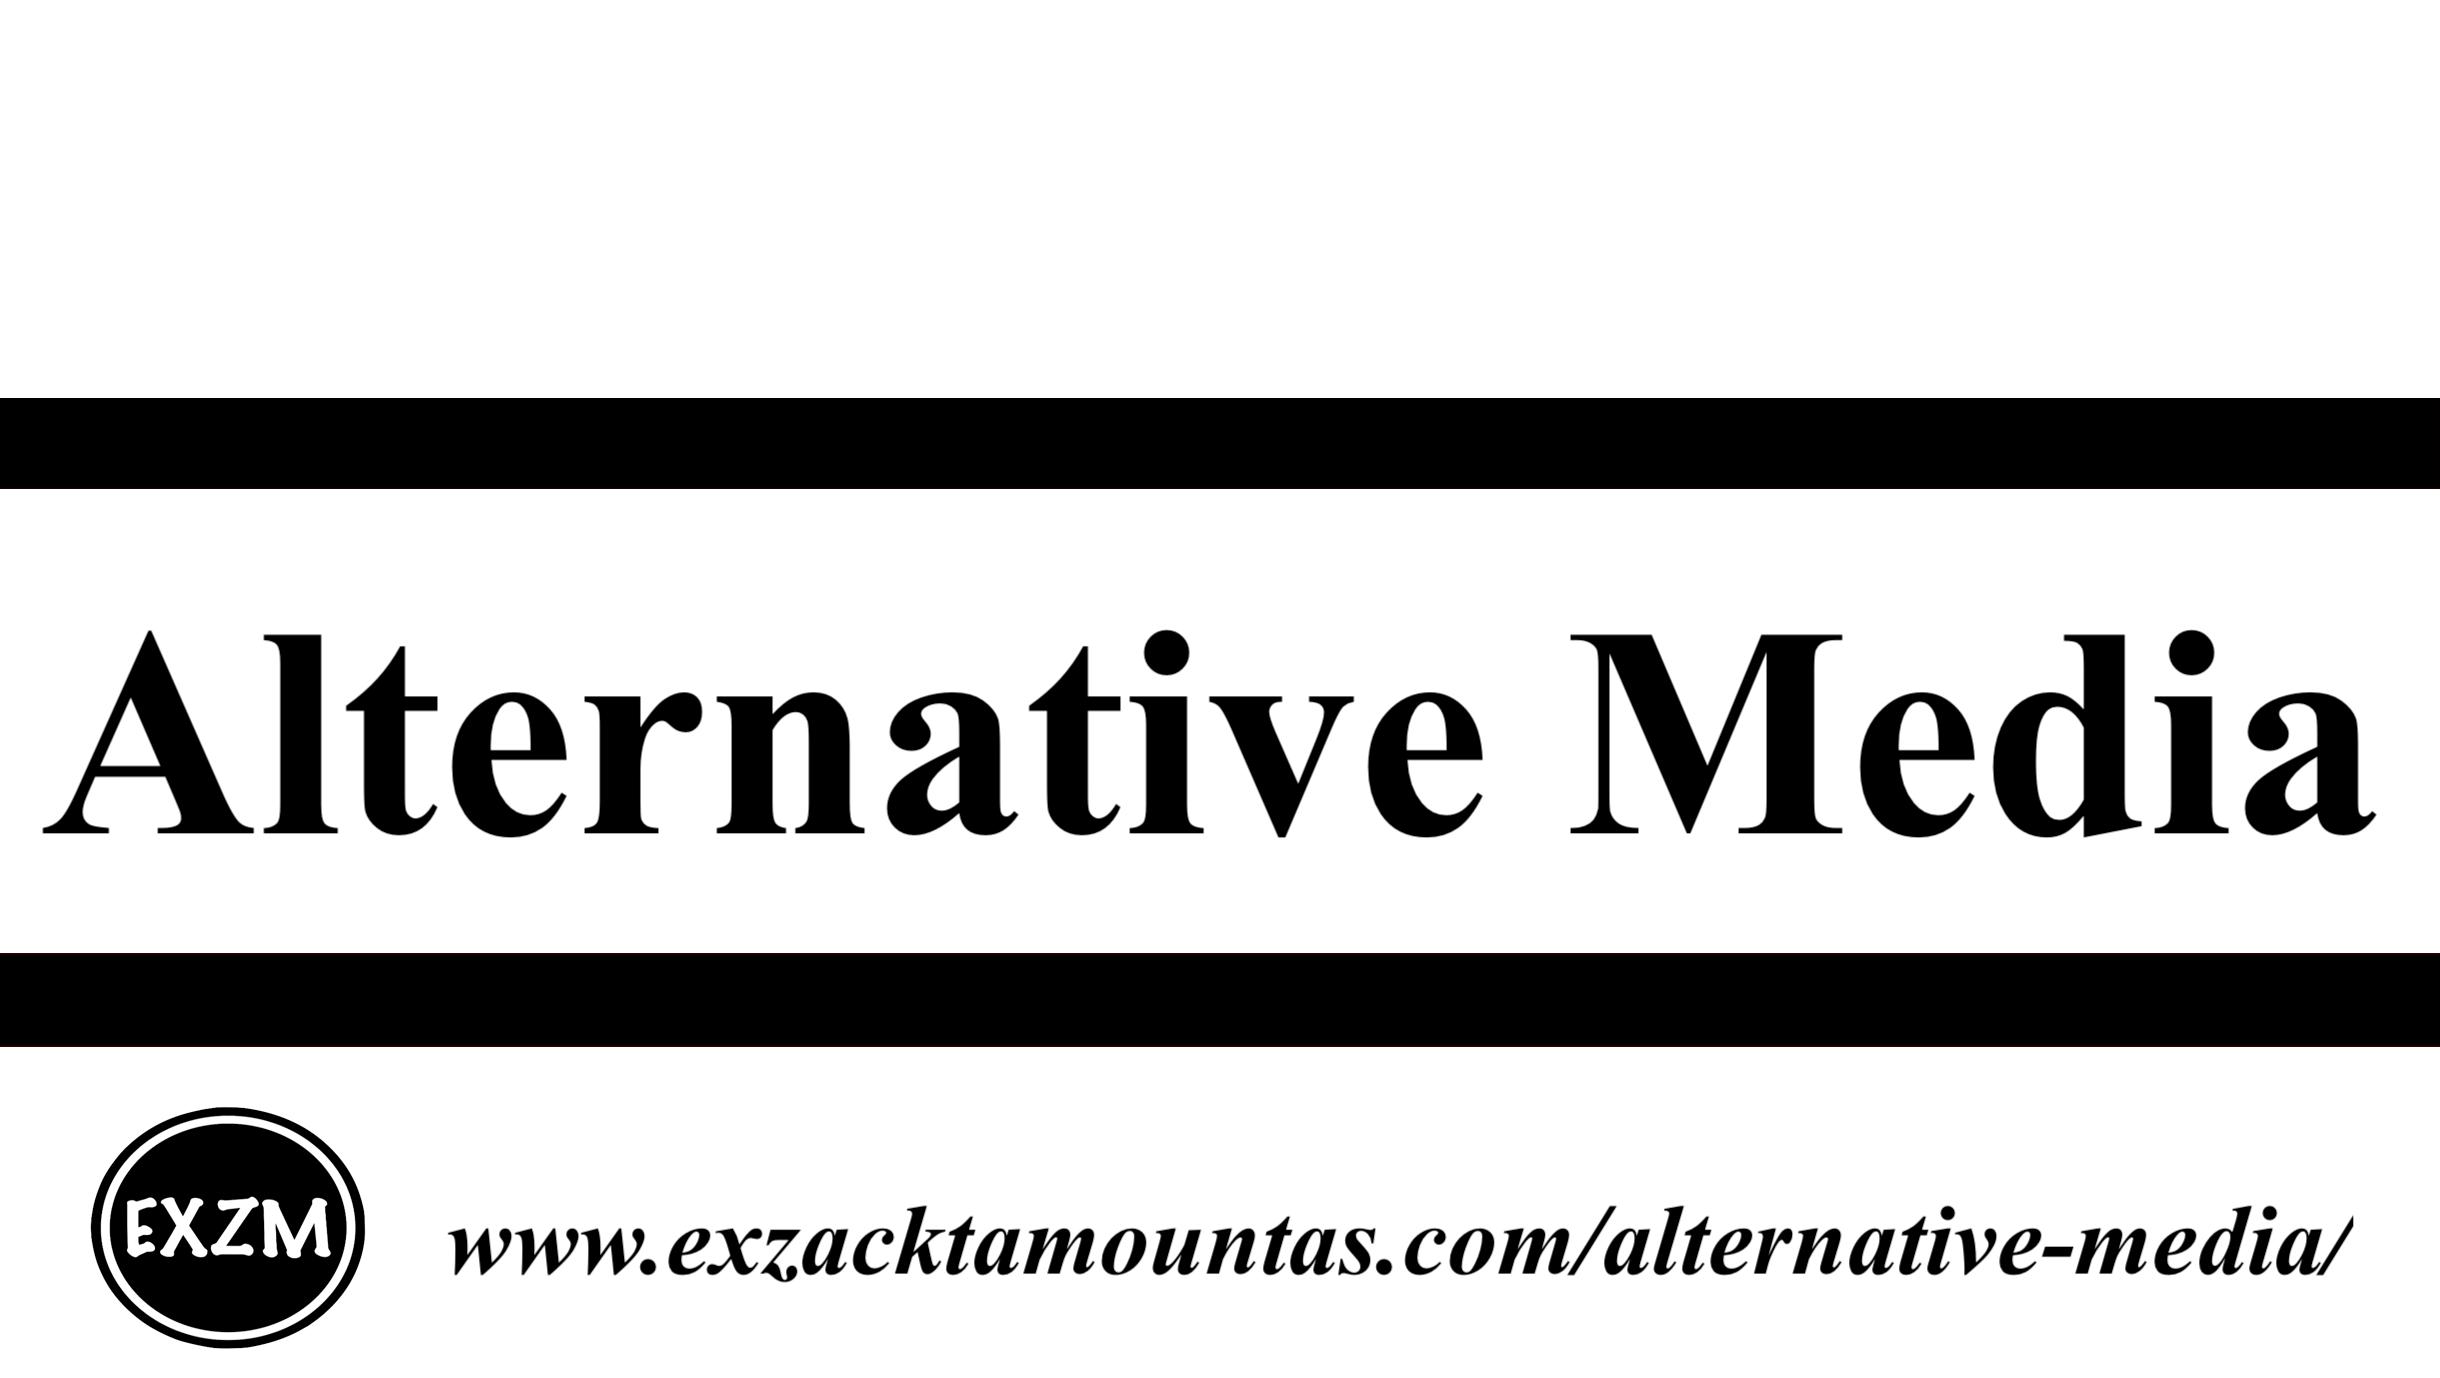 Alternative Media EXZM 9 30 2019